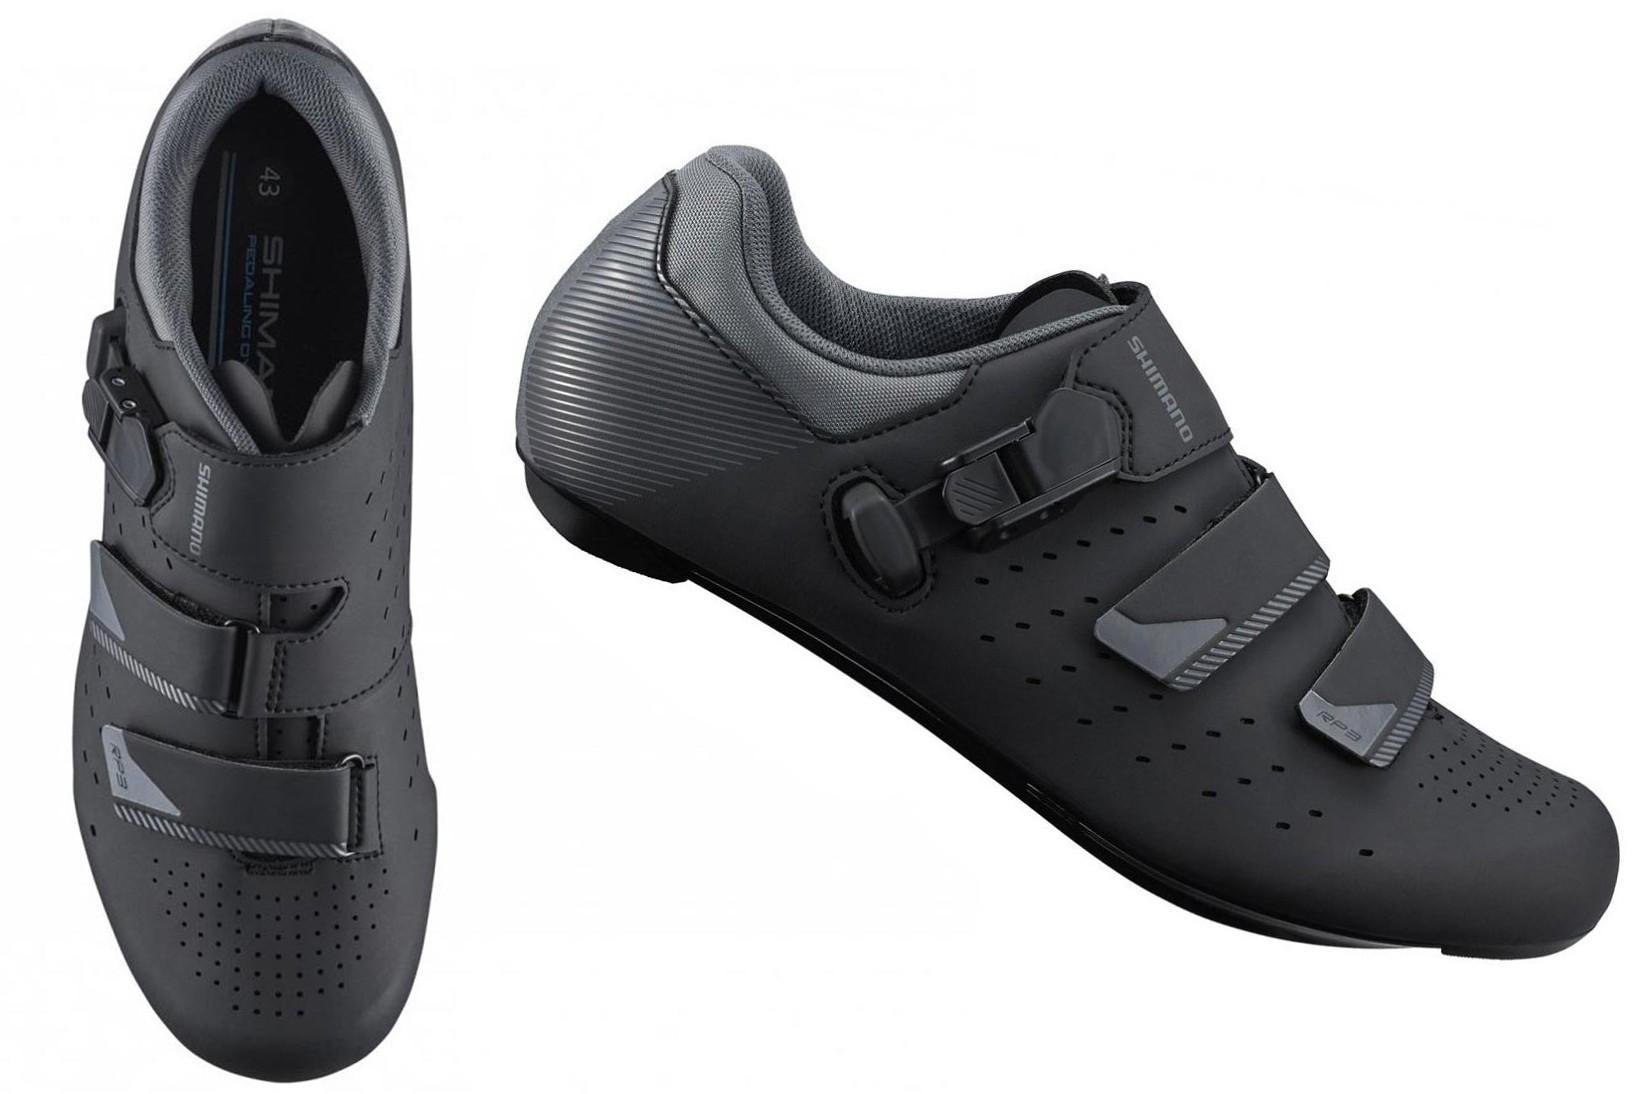 Shimano SH-RP301SL1 buty rozmiar czarne 43